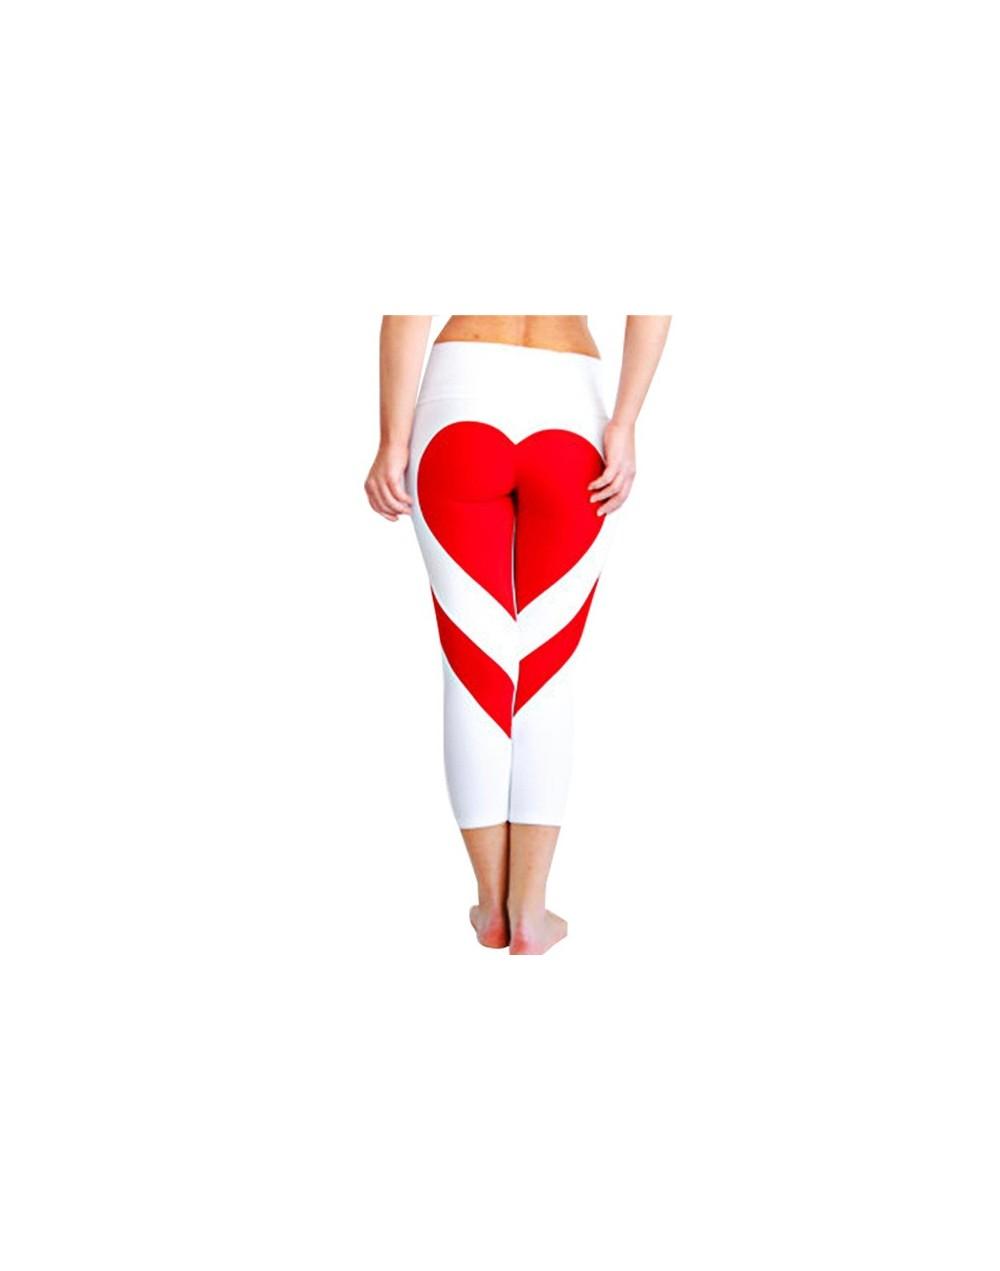 Love Peach Printing Splice Women's Sports And Fitness Leggings Polyester Breathable Plus Size Leggings Fashion Legins - Blac...